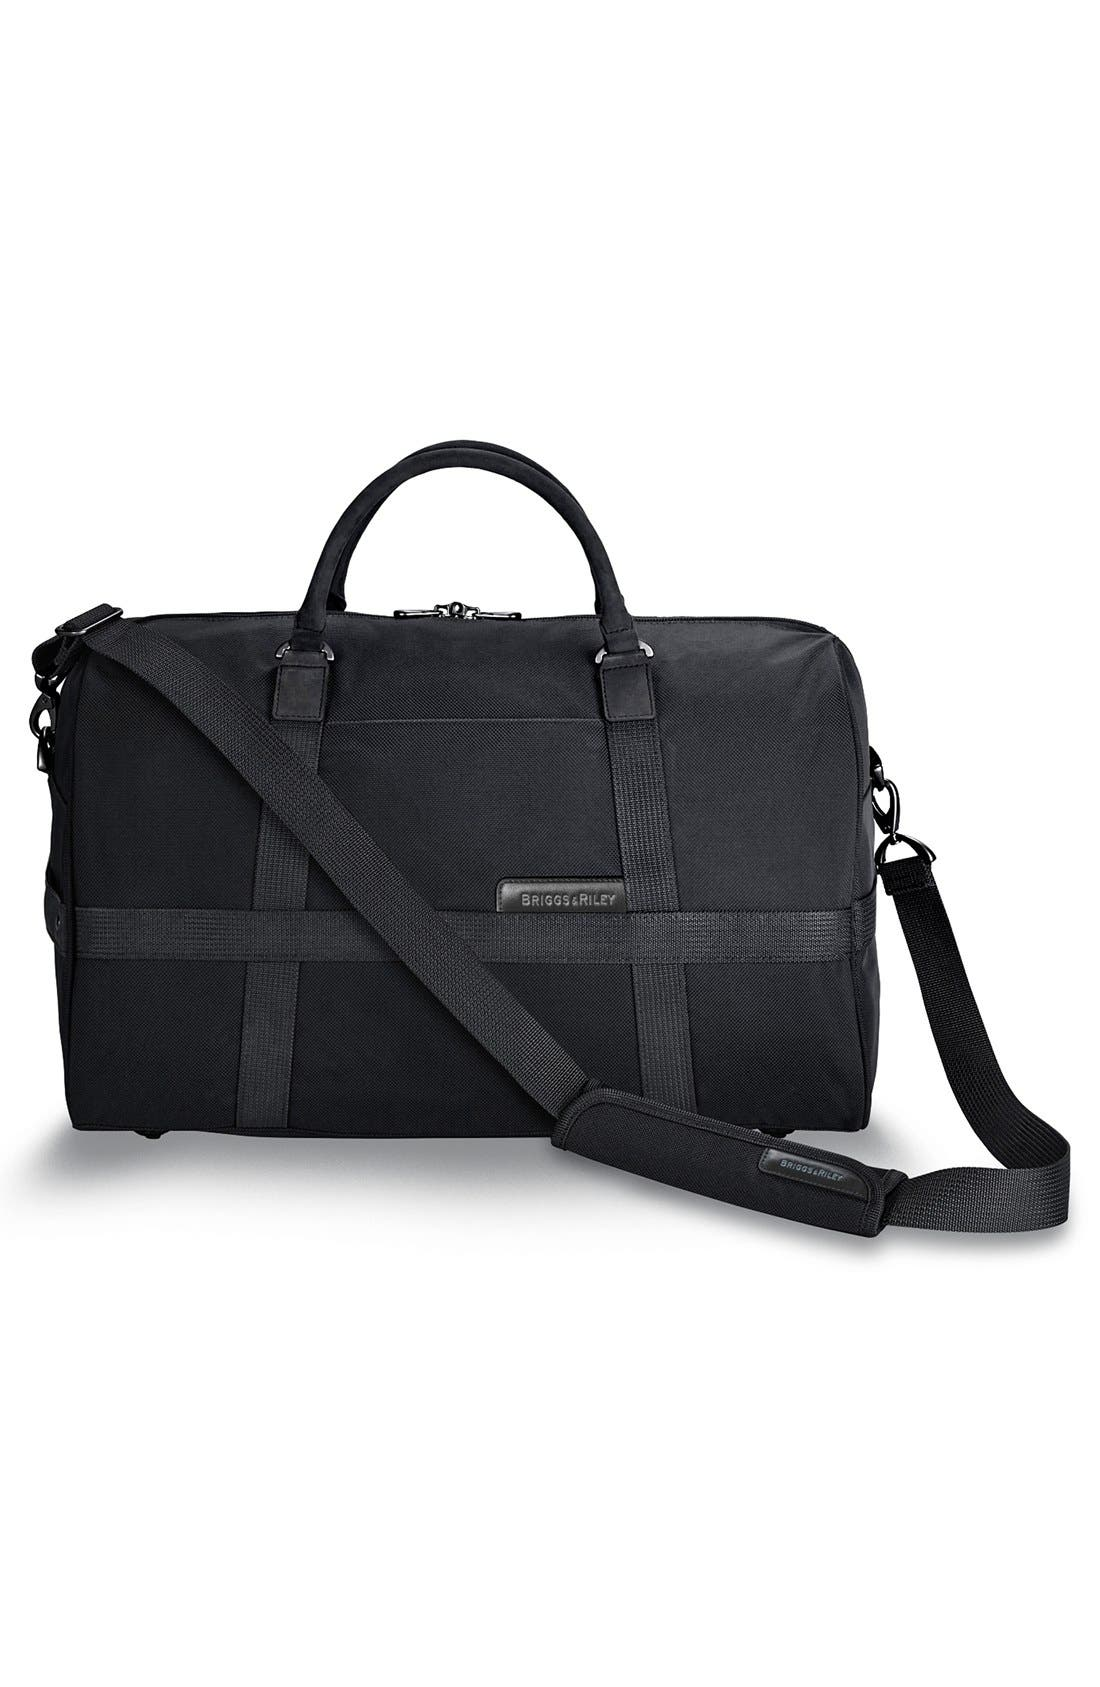 'Baseline - Medium' Duffel Bag,                             Alternate thumbnail 8, color,